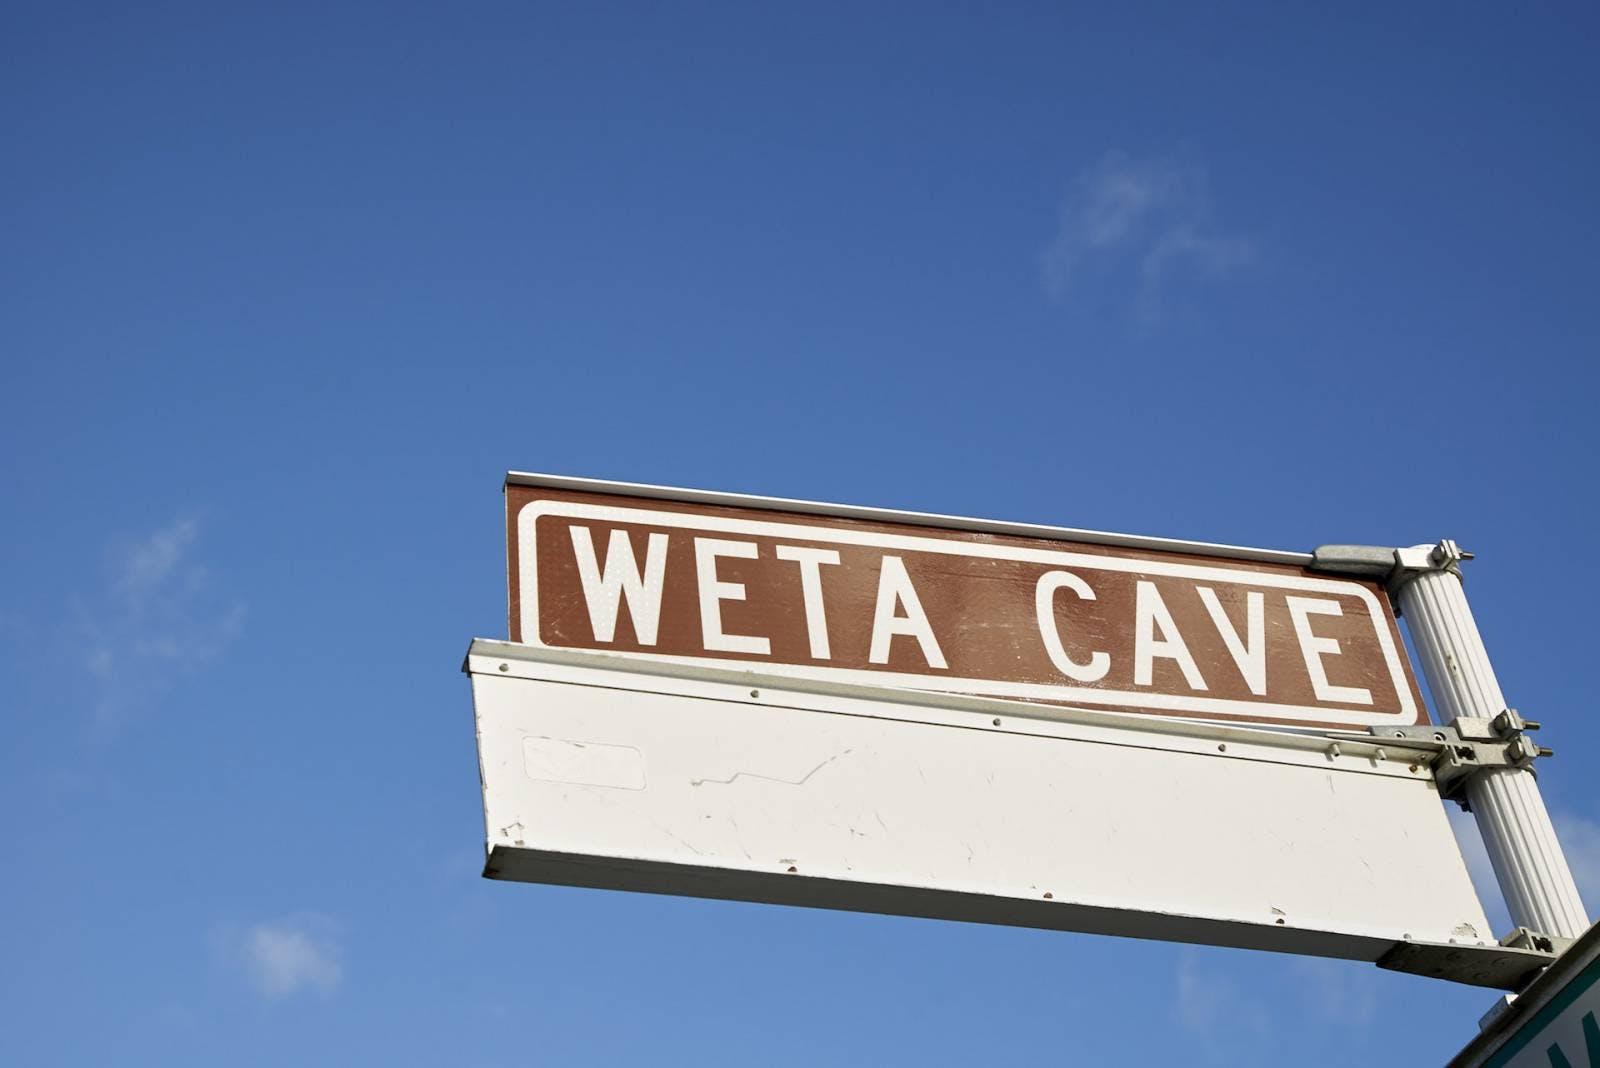 weta cave wellington